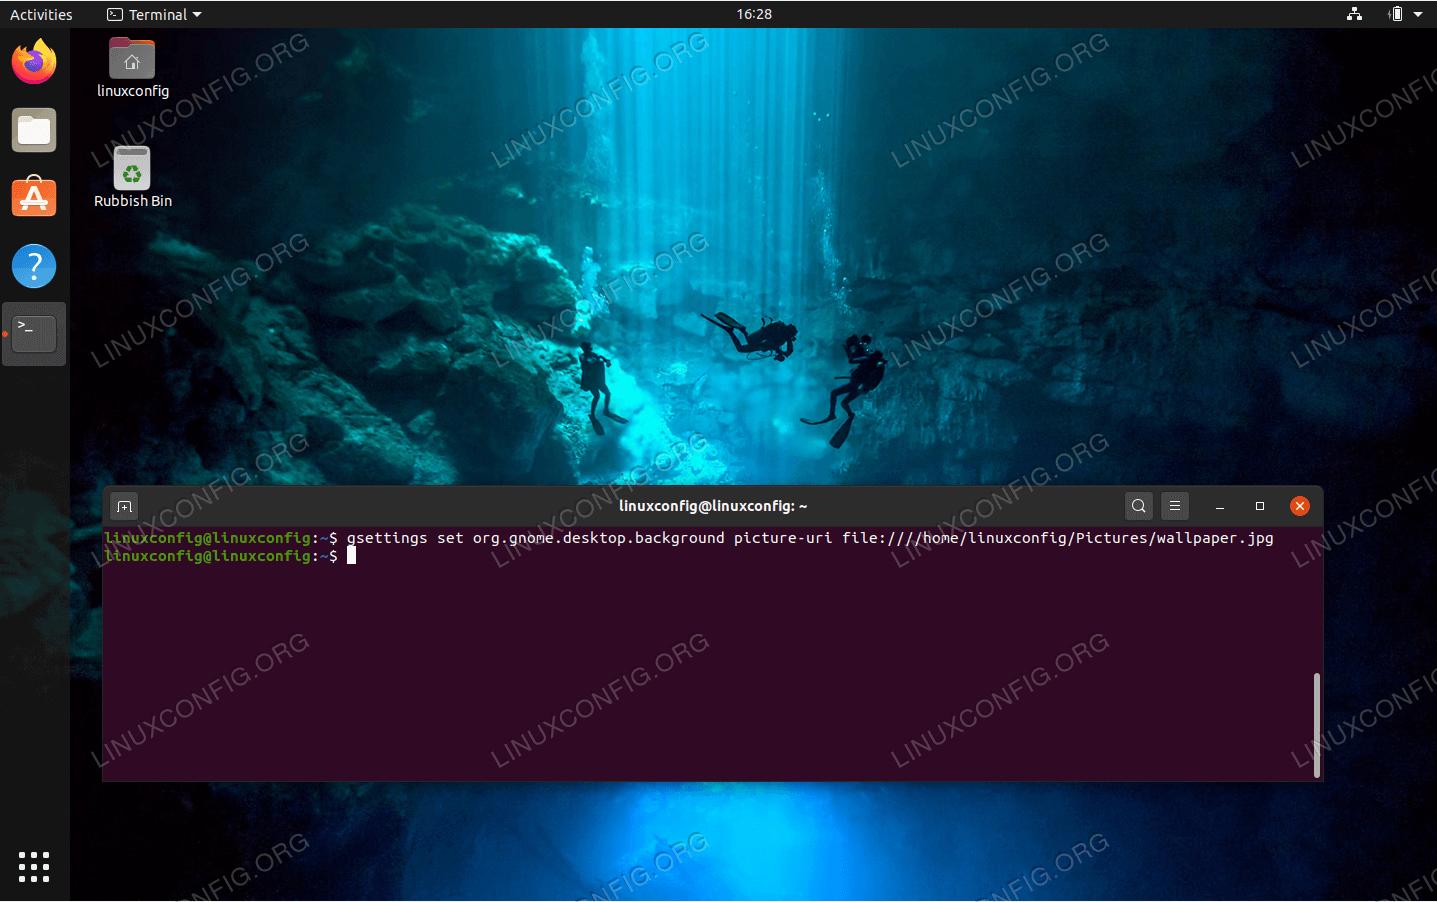 Set wallpaper on Ubuntu 20.04 using command line